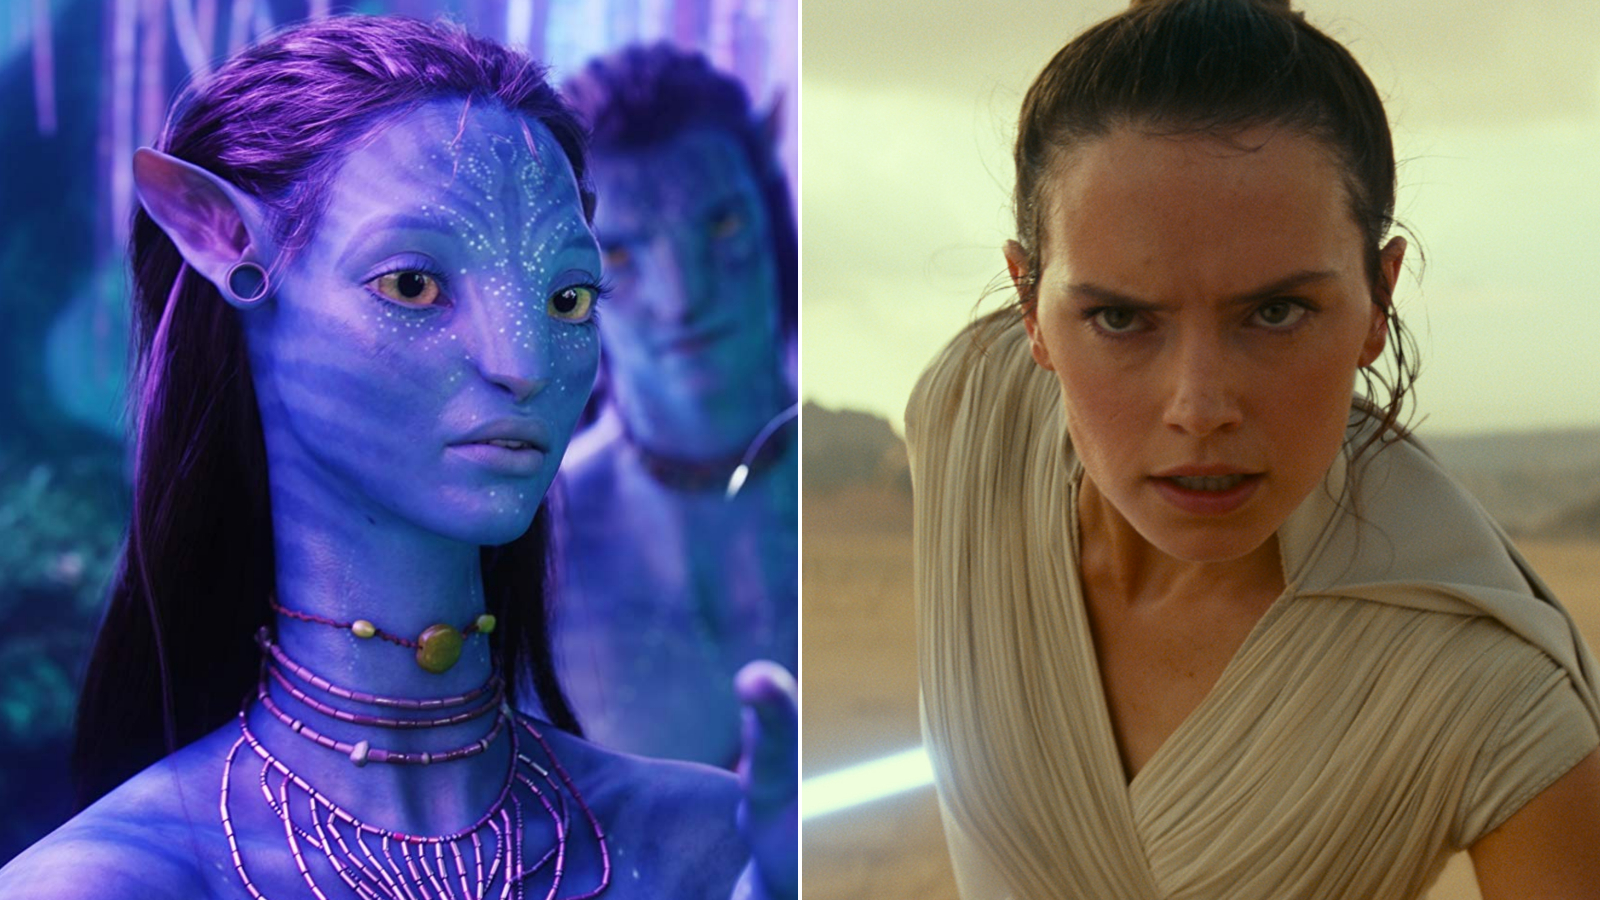 Disney delays 'Star Wars' and 'Avatar' films, takes 'Mulan' off the calendar